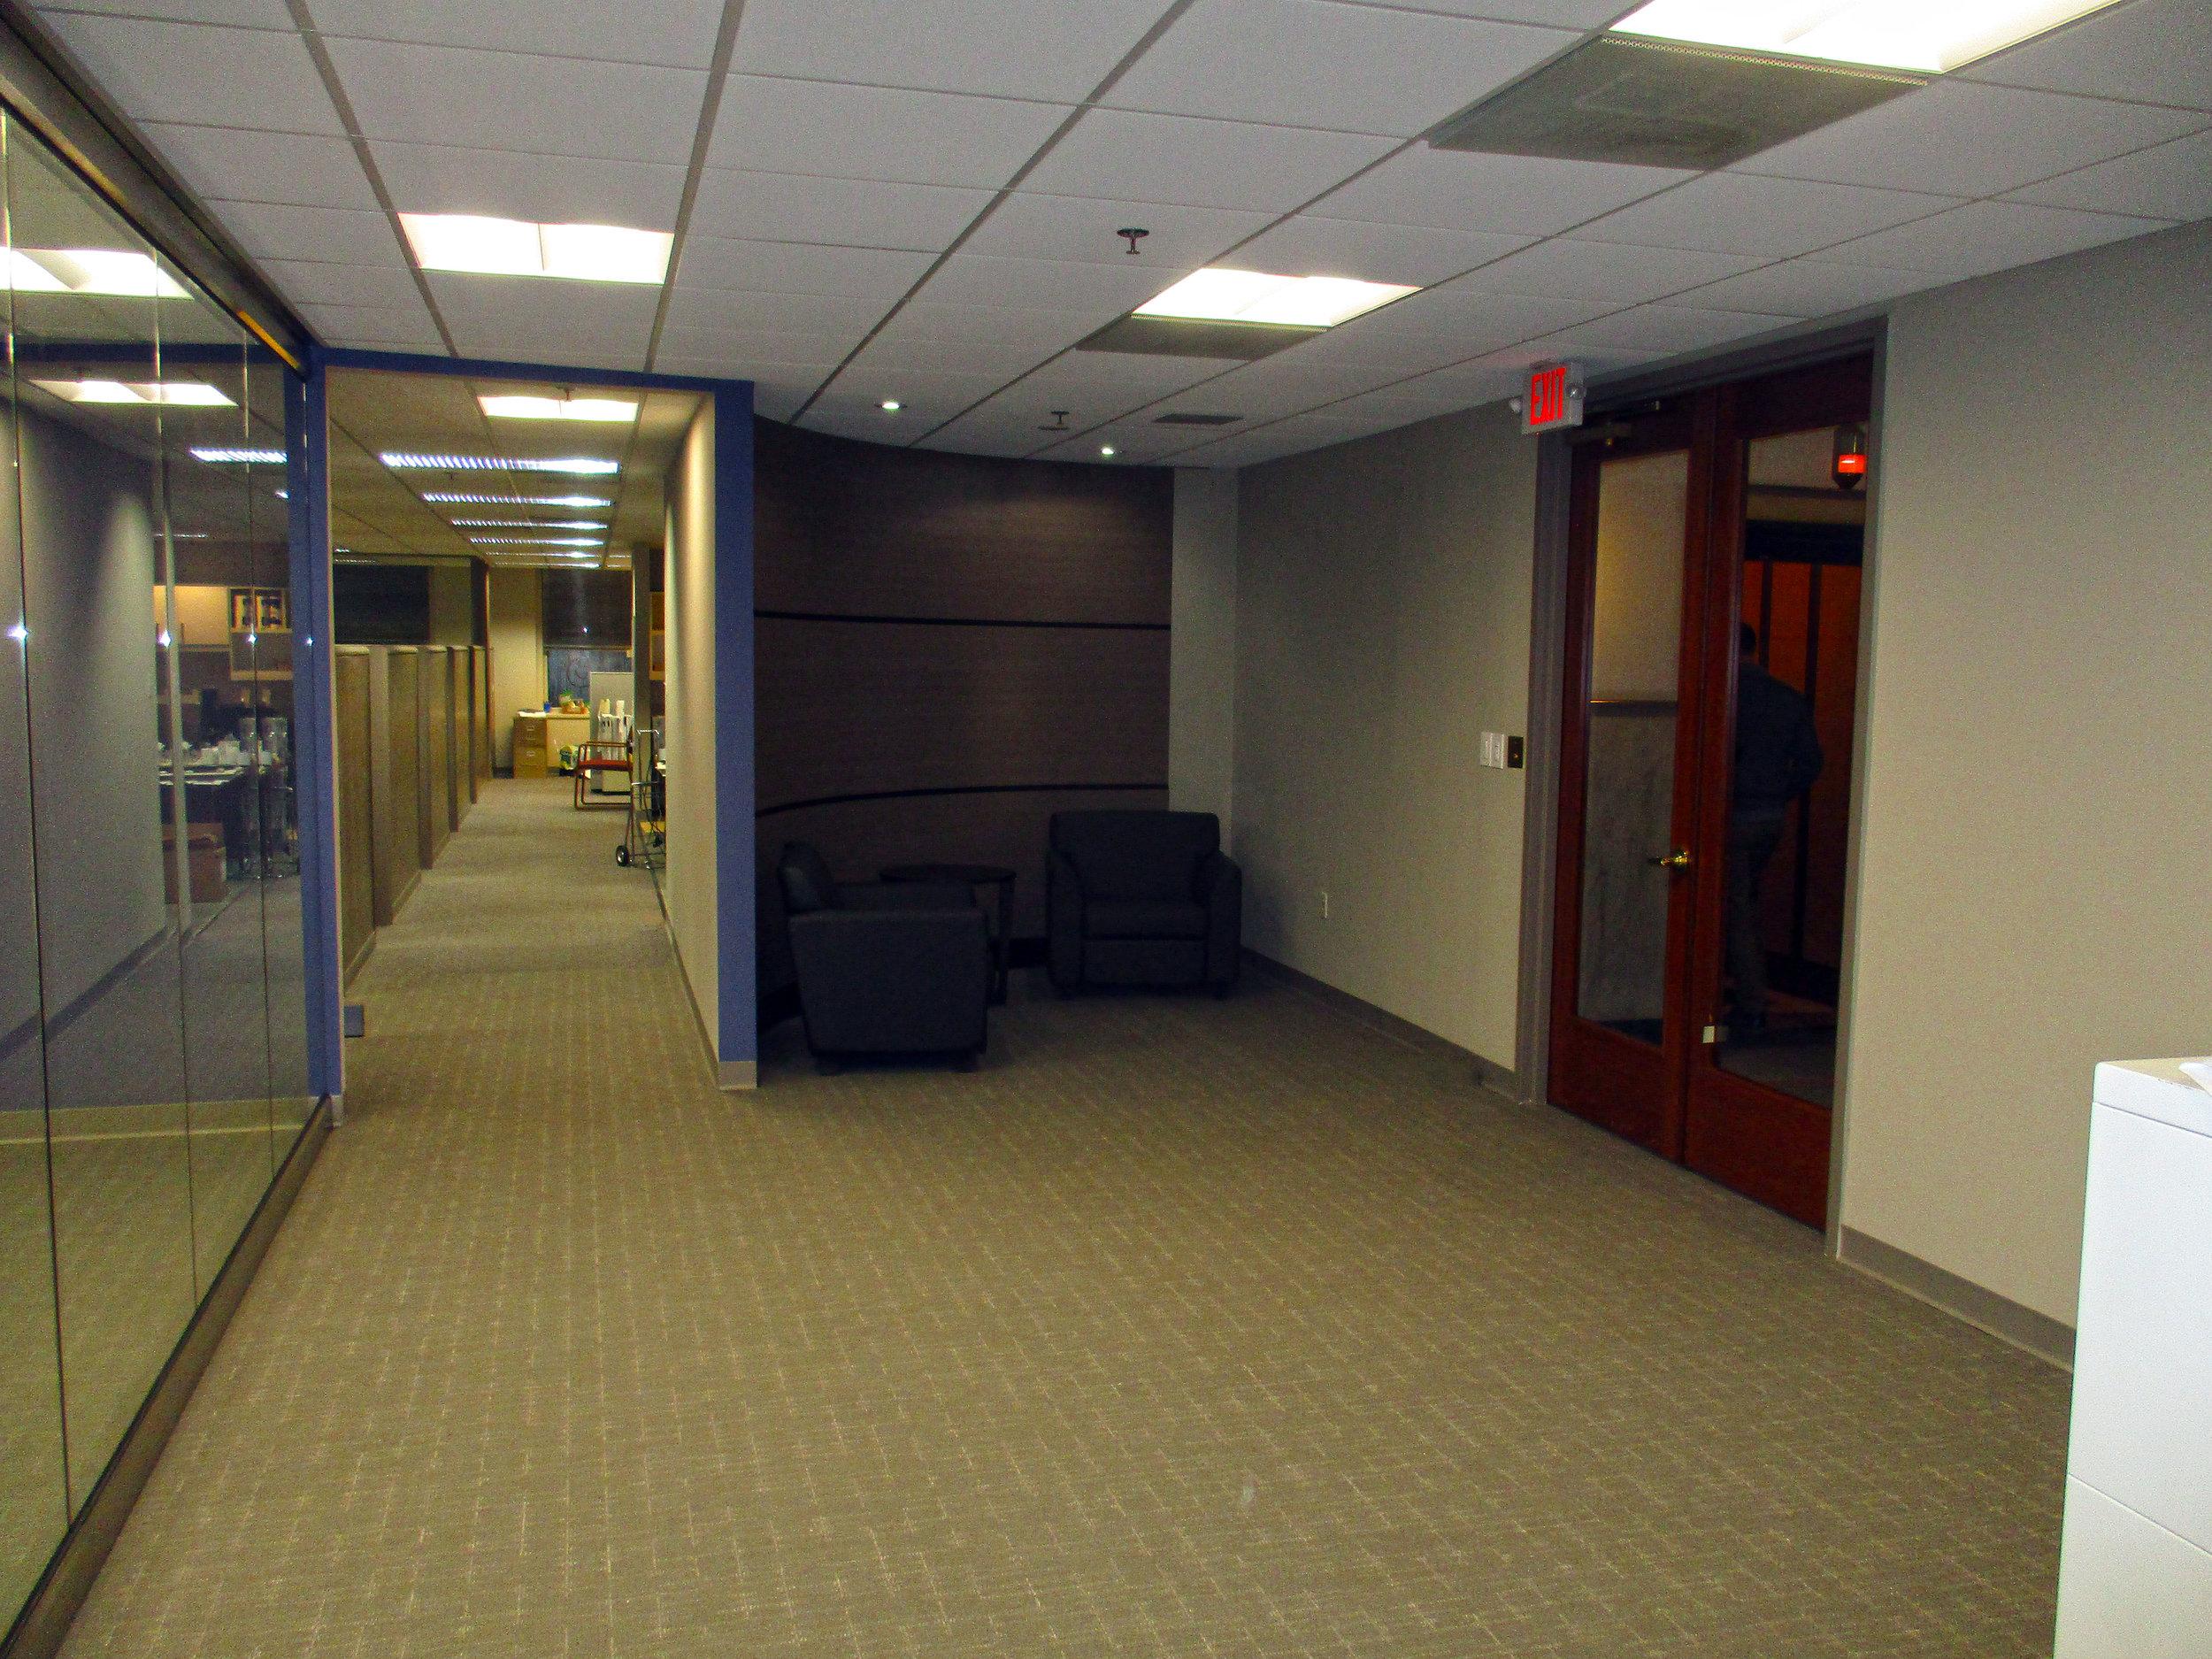 Green Design in Facility Planning and Corporate Interior Design